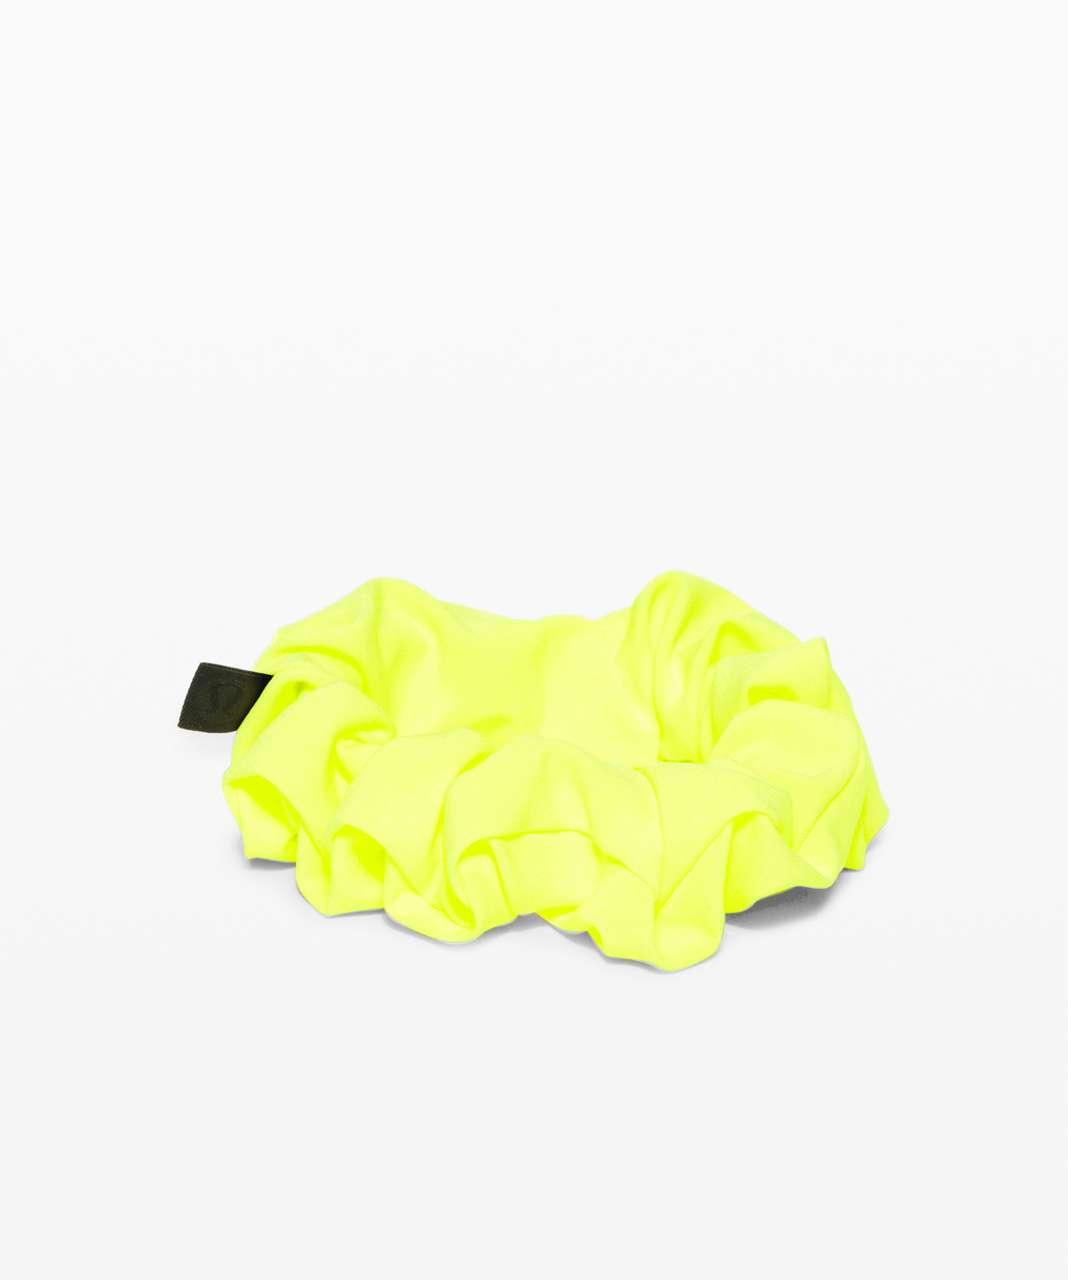 Lululemon Uplifting Scrunchie - Highlight Yellow